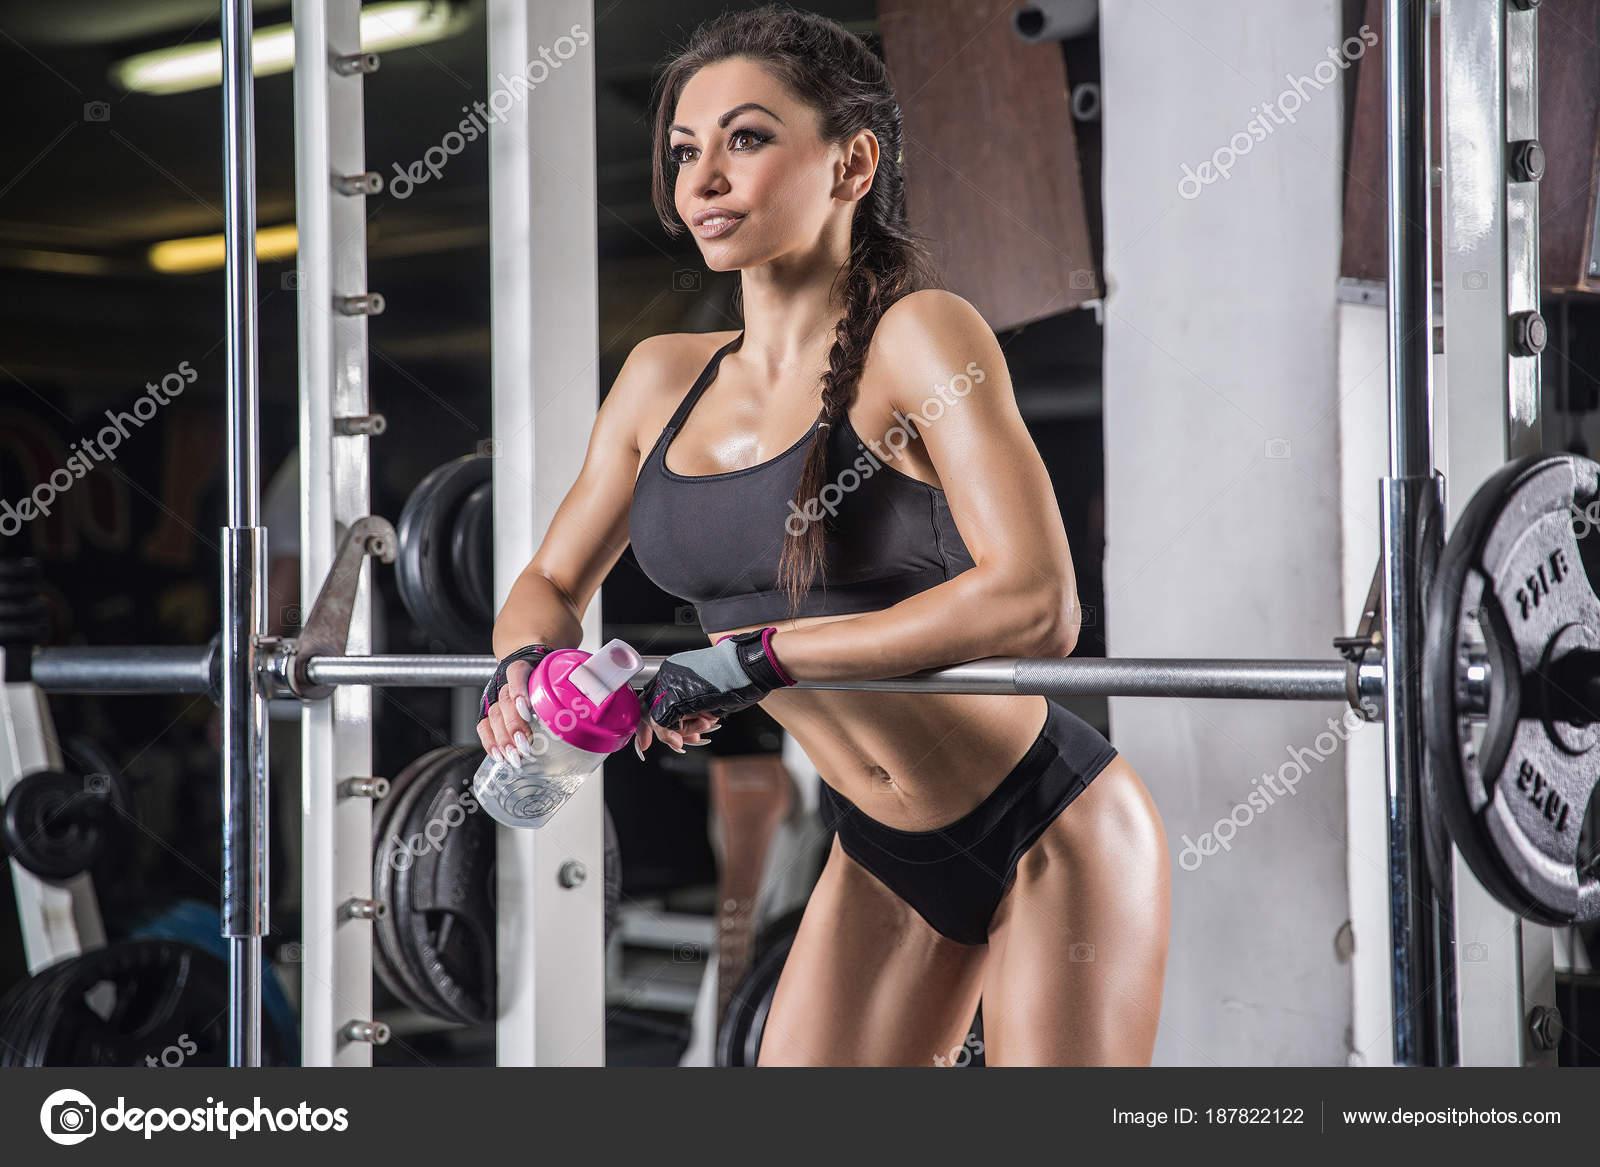 b5d4a6af32d7b Fitness kadın spor giyim gy mükemmel seksi fitness vücut ile– stok imaj